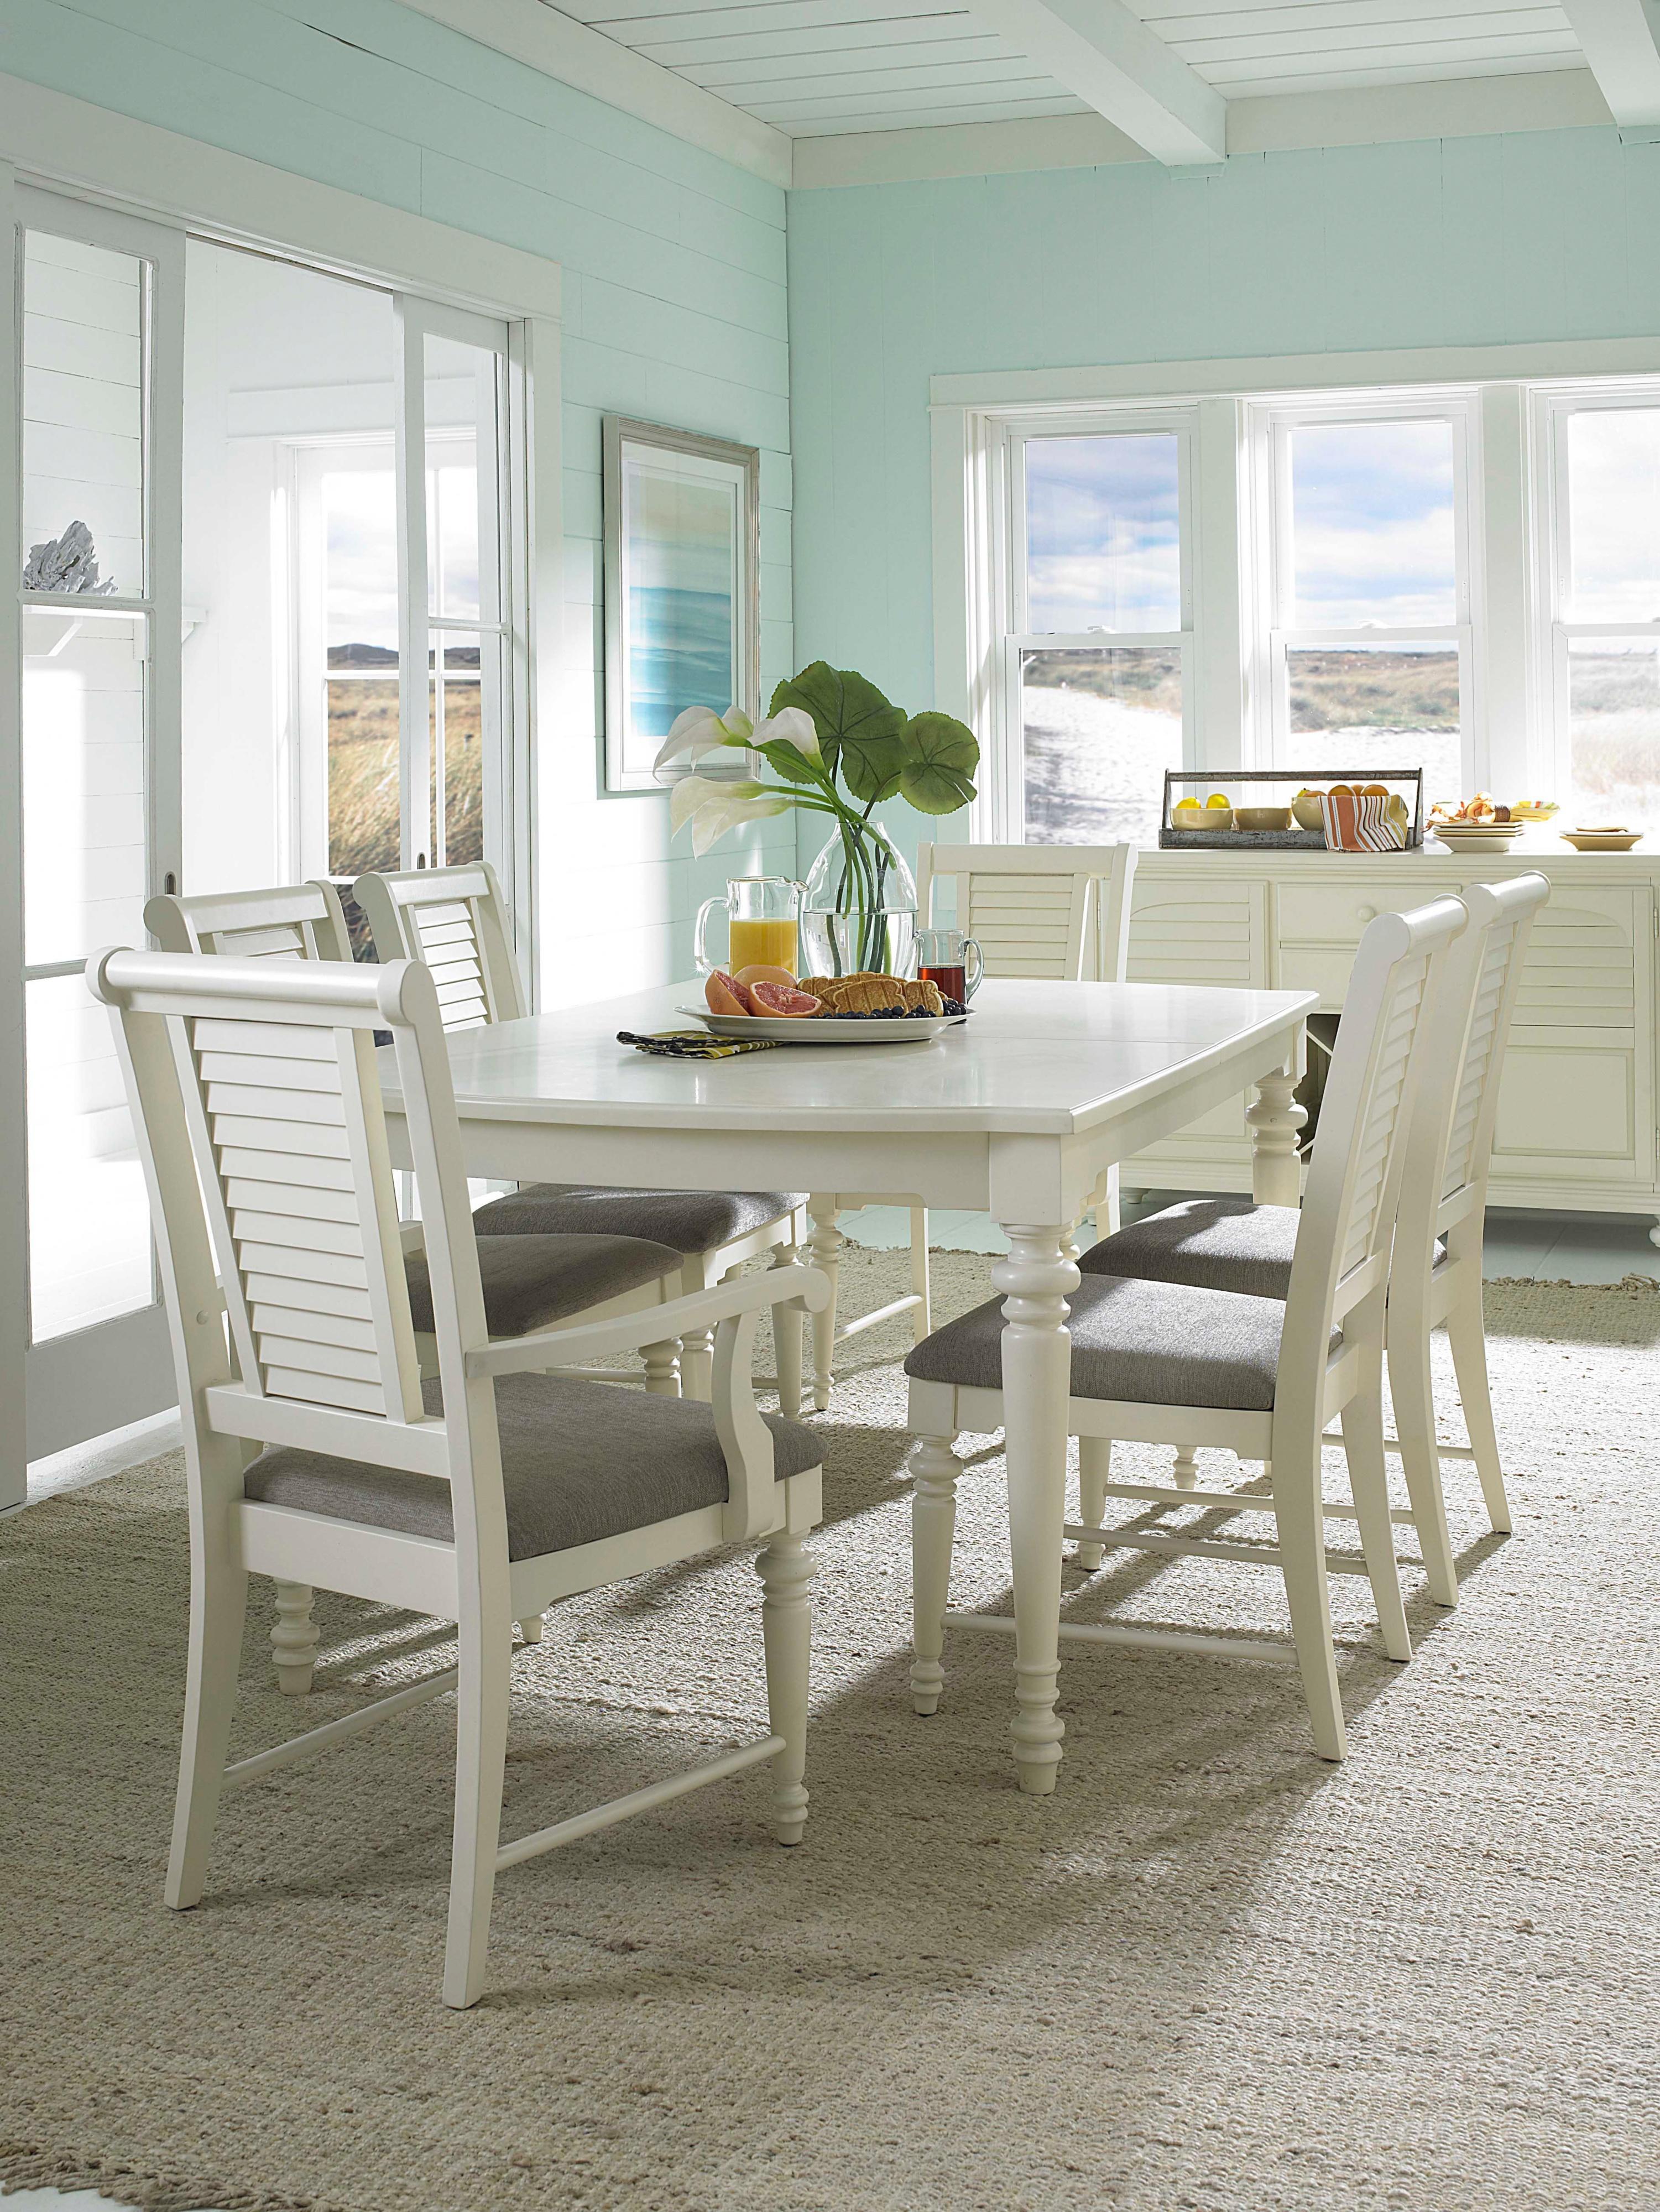 Broyhill Furniture Seabrooke 4471 532 Turned Leg Dining